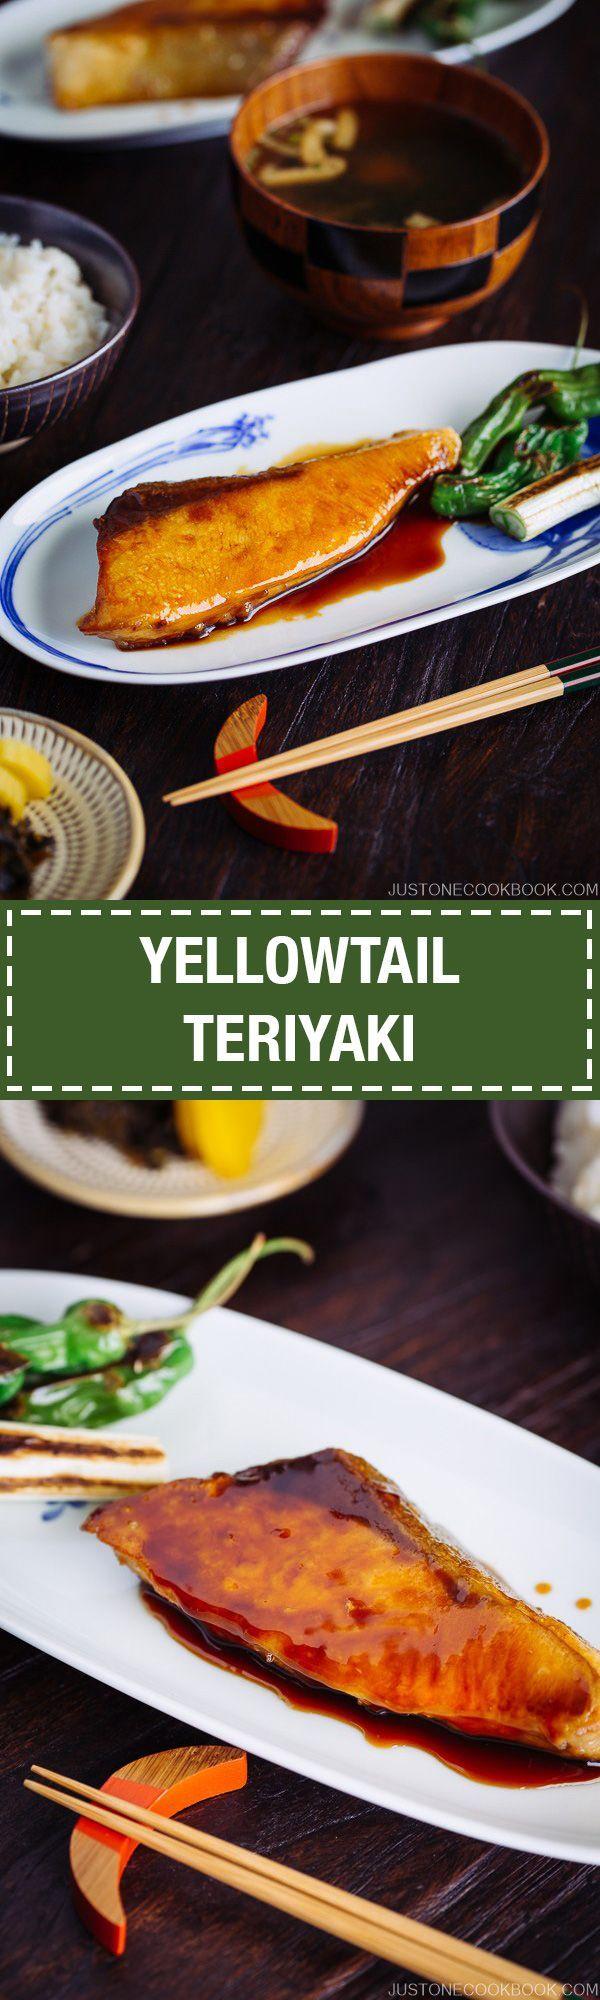 Yellowtail Teriyaki ぶりの照り焼き | Easy Japanese Recipes at JustOneCookbook.com